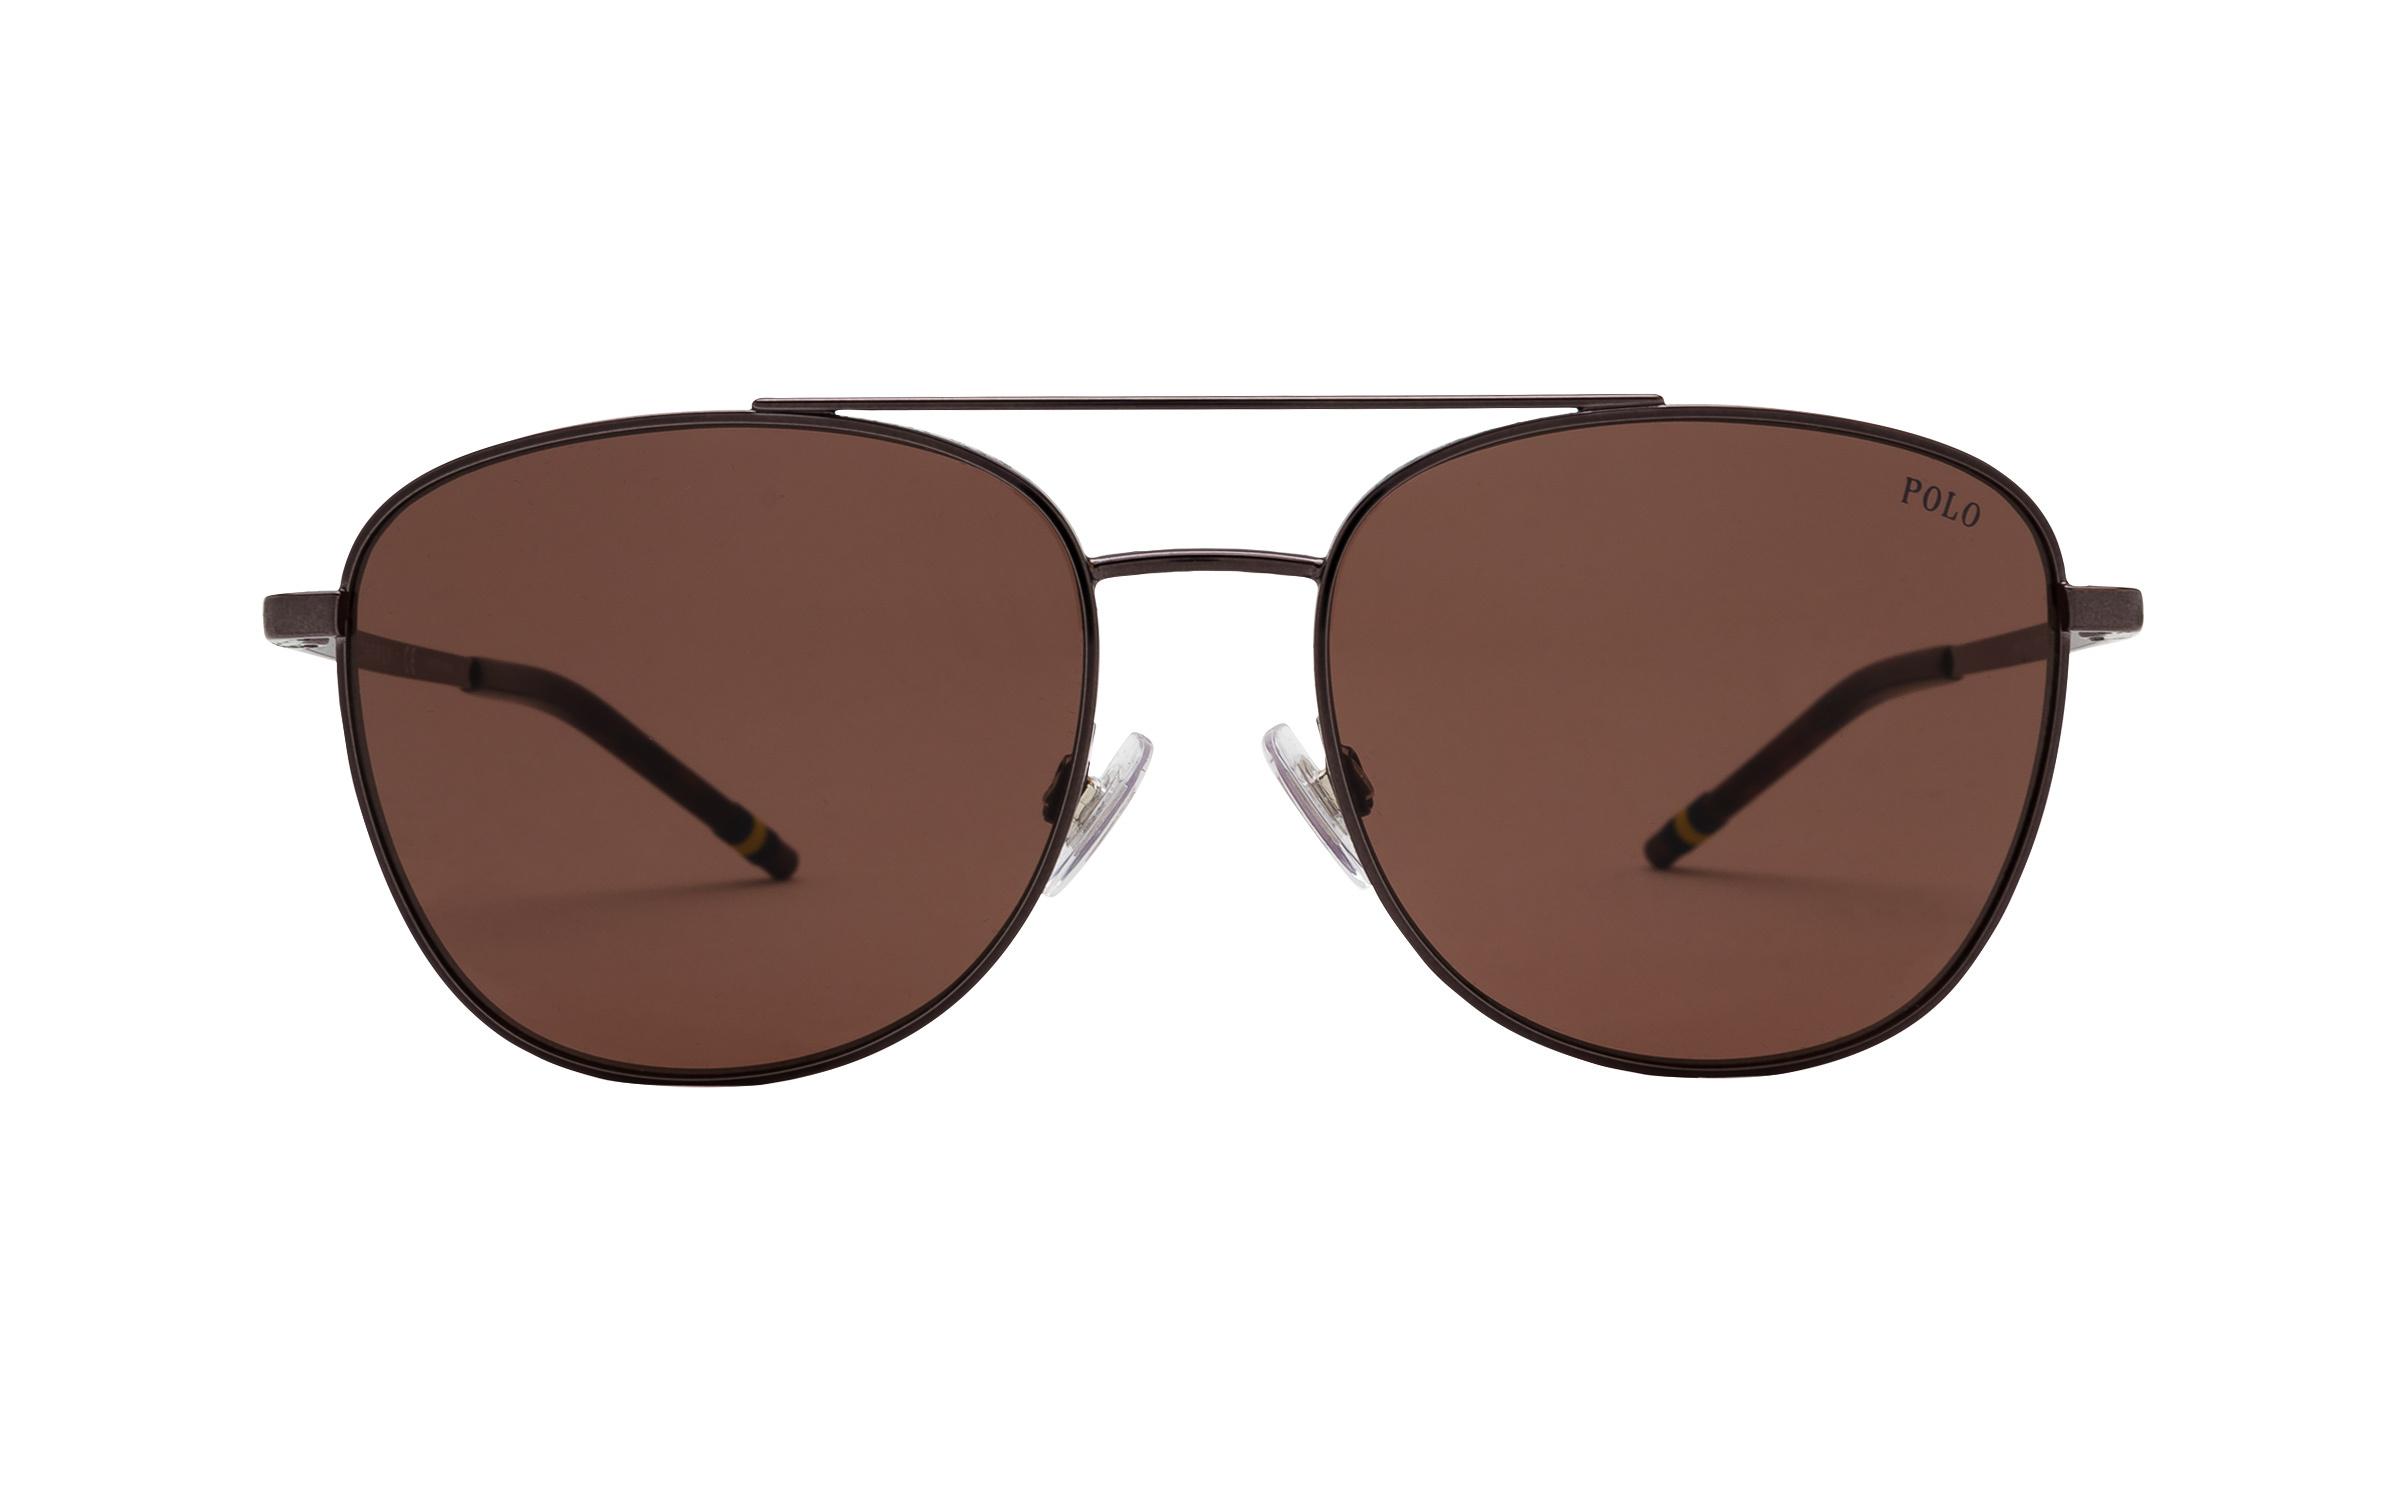 http://www.coastal.com/ - Luxottica Polo Ralph Lauren PH3127 915773 57 Sunglasses in Dark Gunmetal Grey | Plastic/Metal – Online Coastal